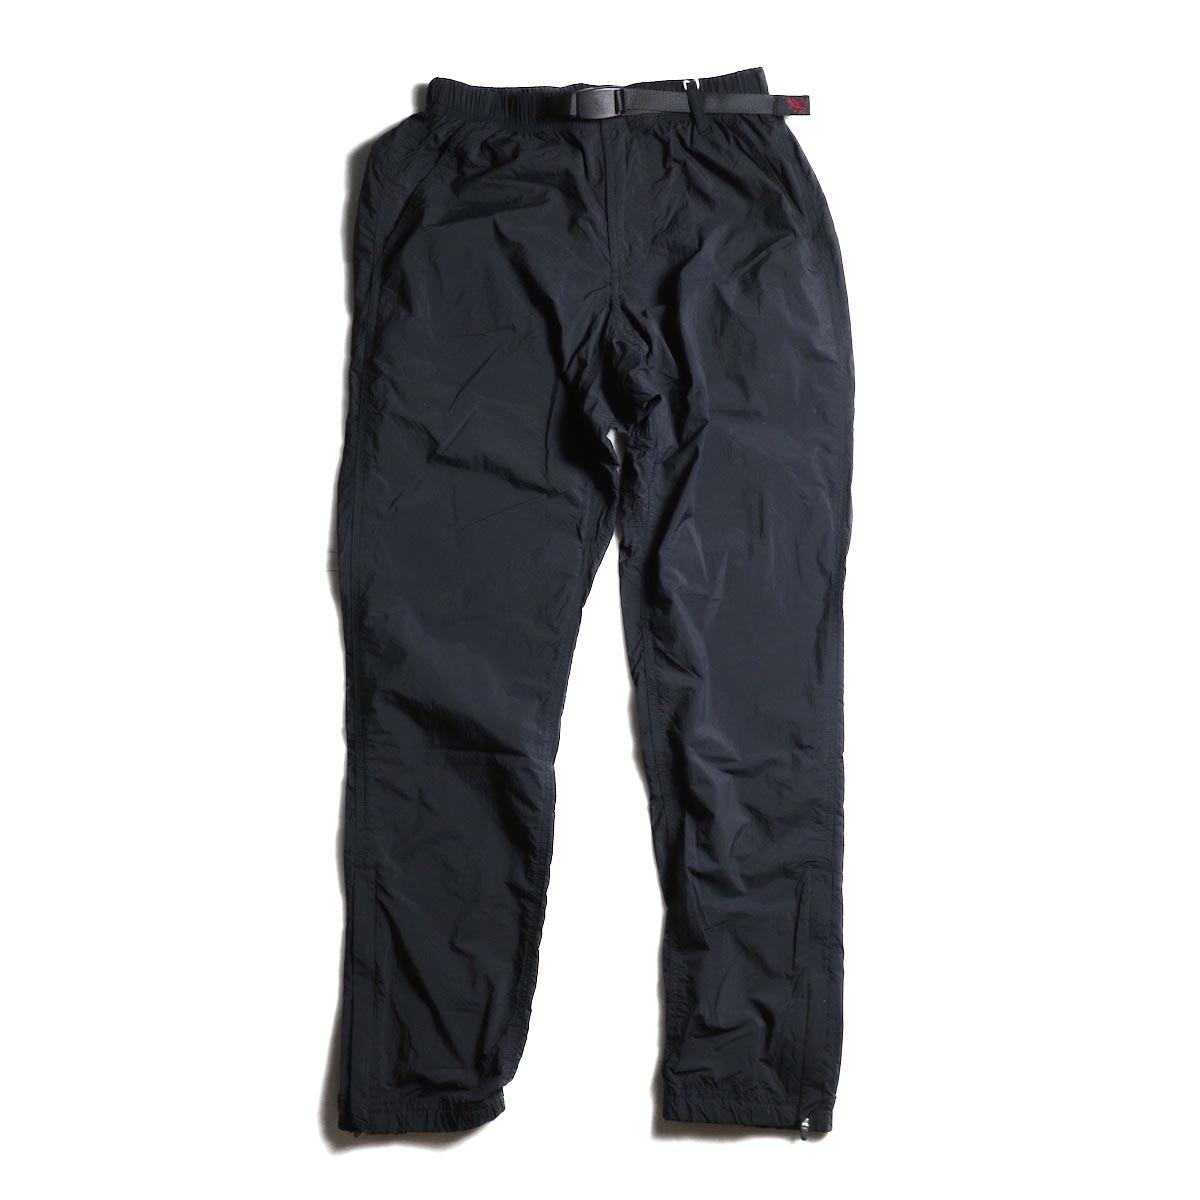 GRAMICCI / Packable Truck Pants (Black) 正面